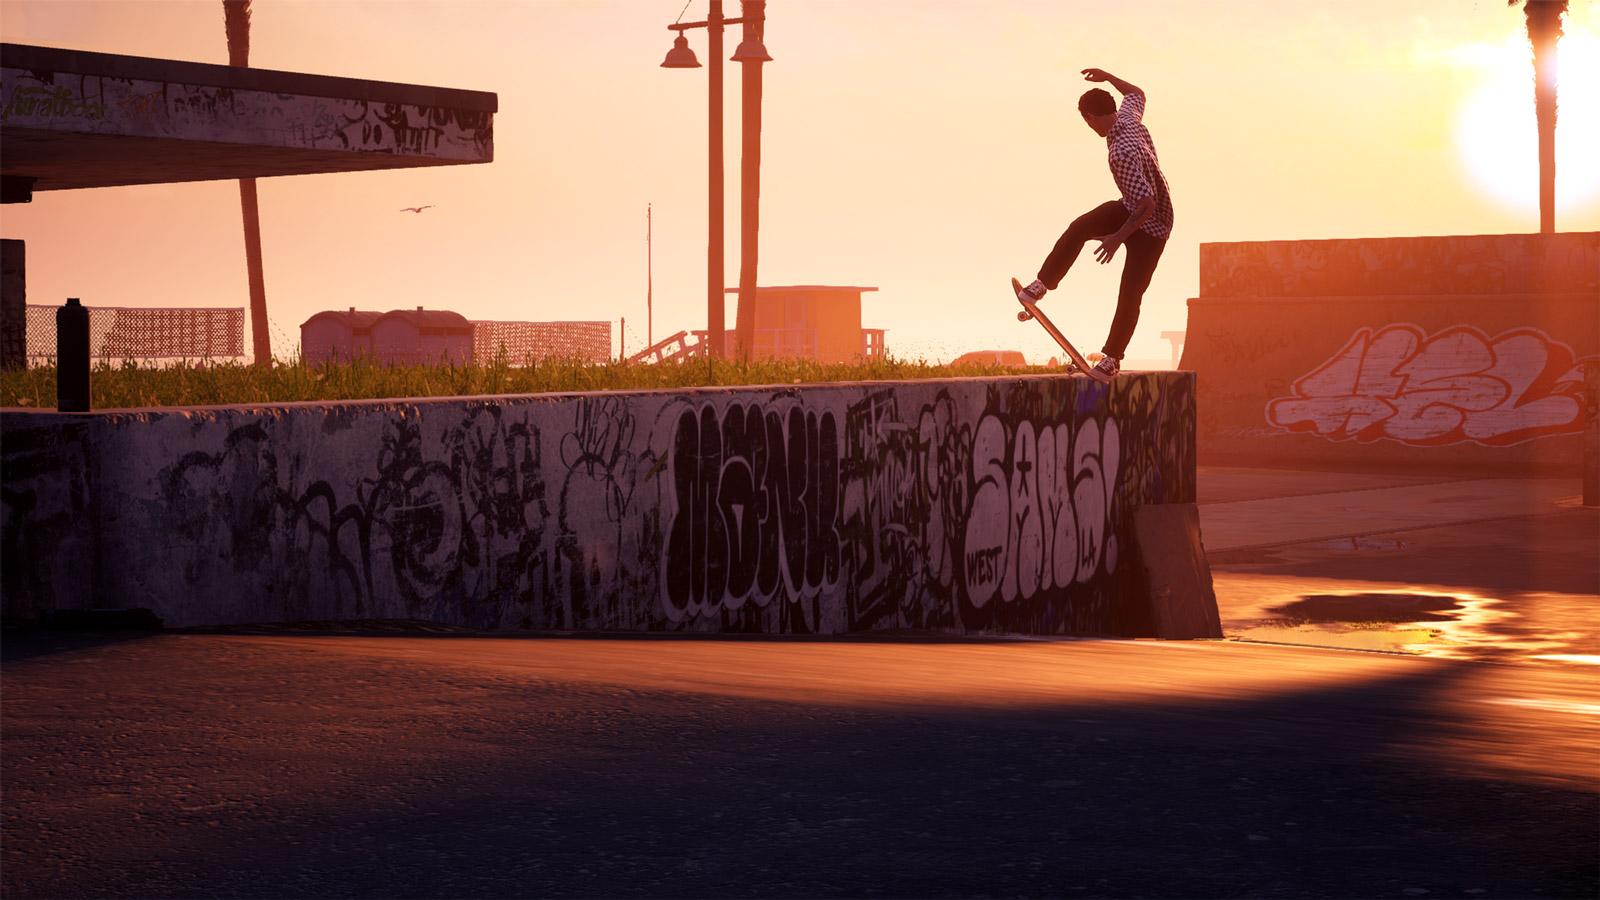 Free Tony Hawk's Pro Skater 1 + 2 Wallpaper in 1600x900